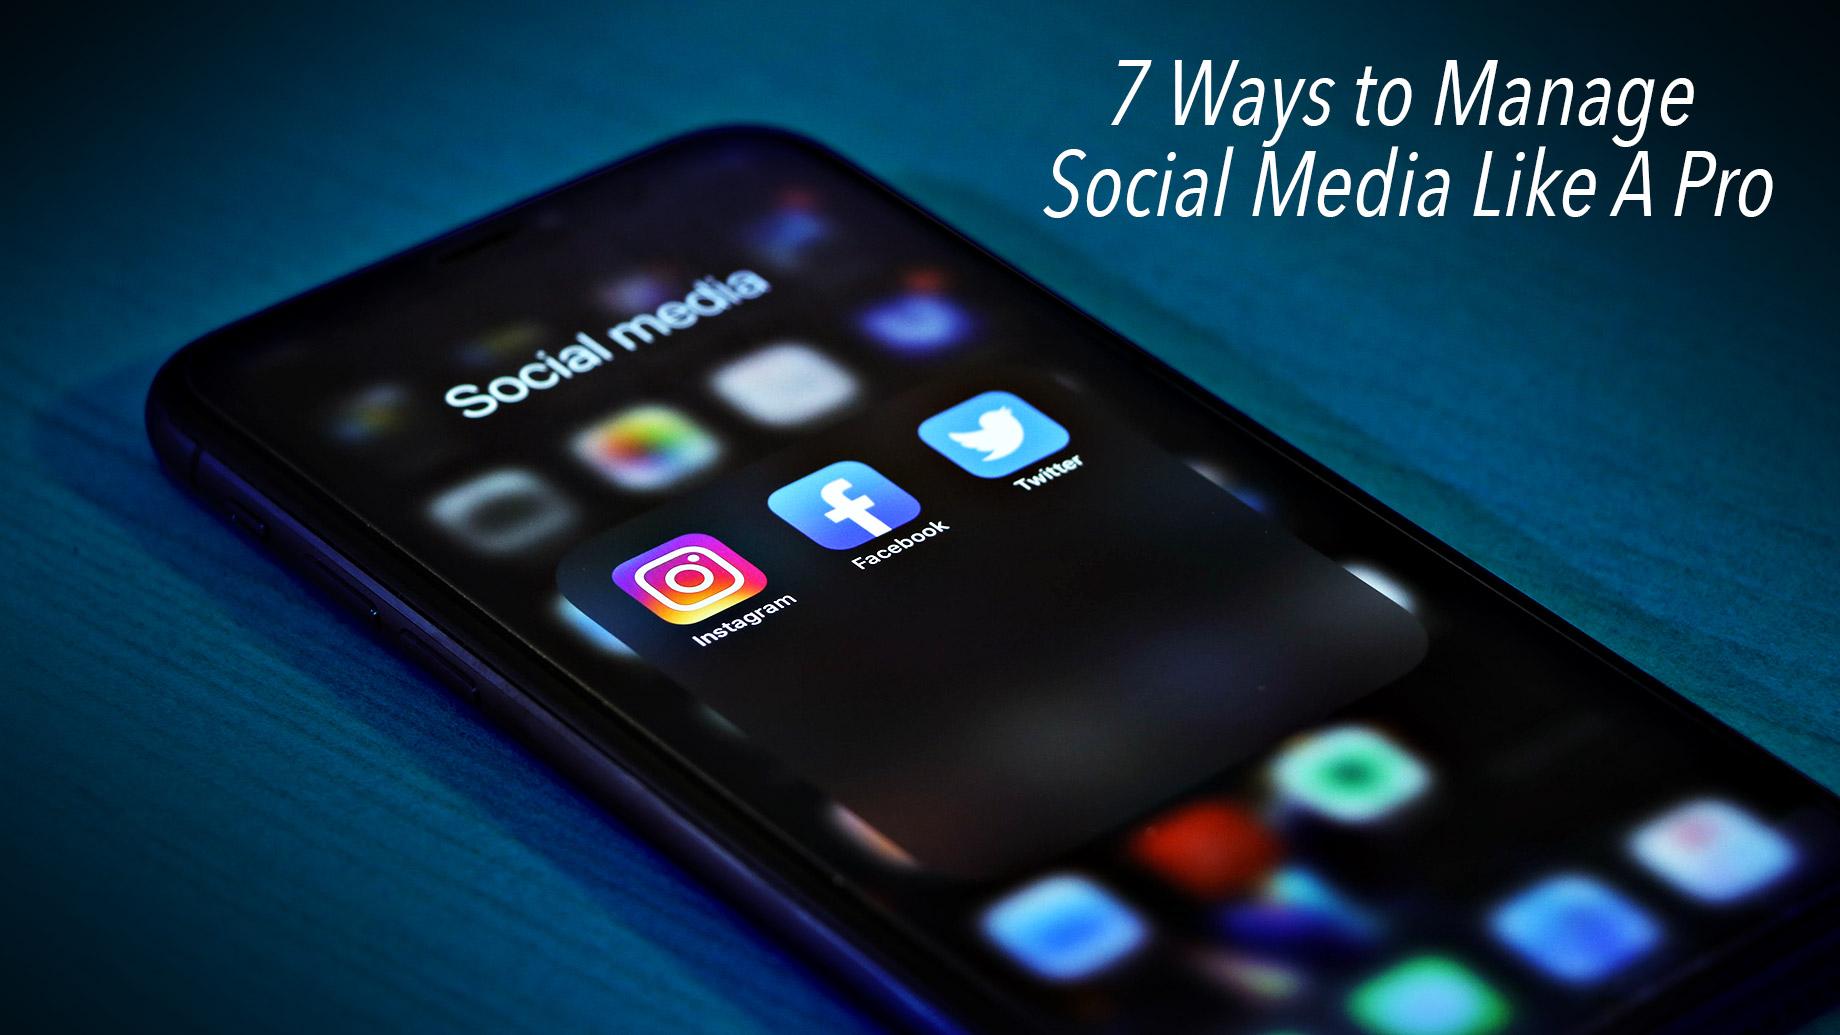 7 Ways to Manage Social Media Like A Pro